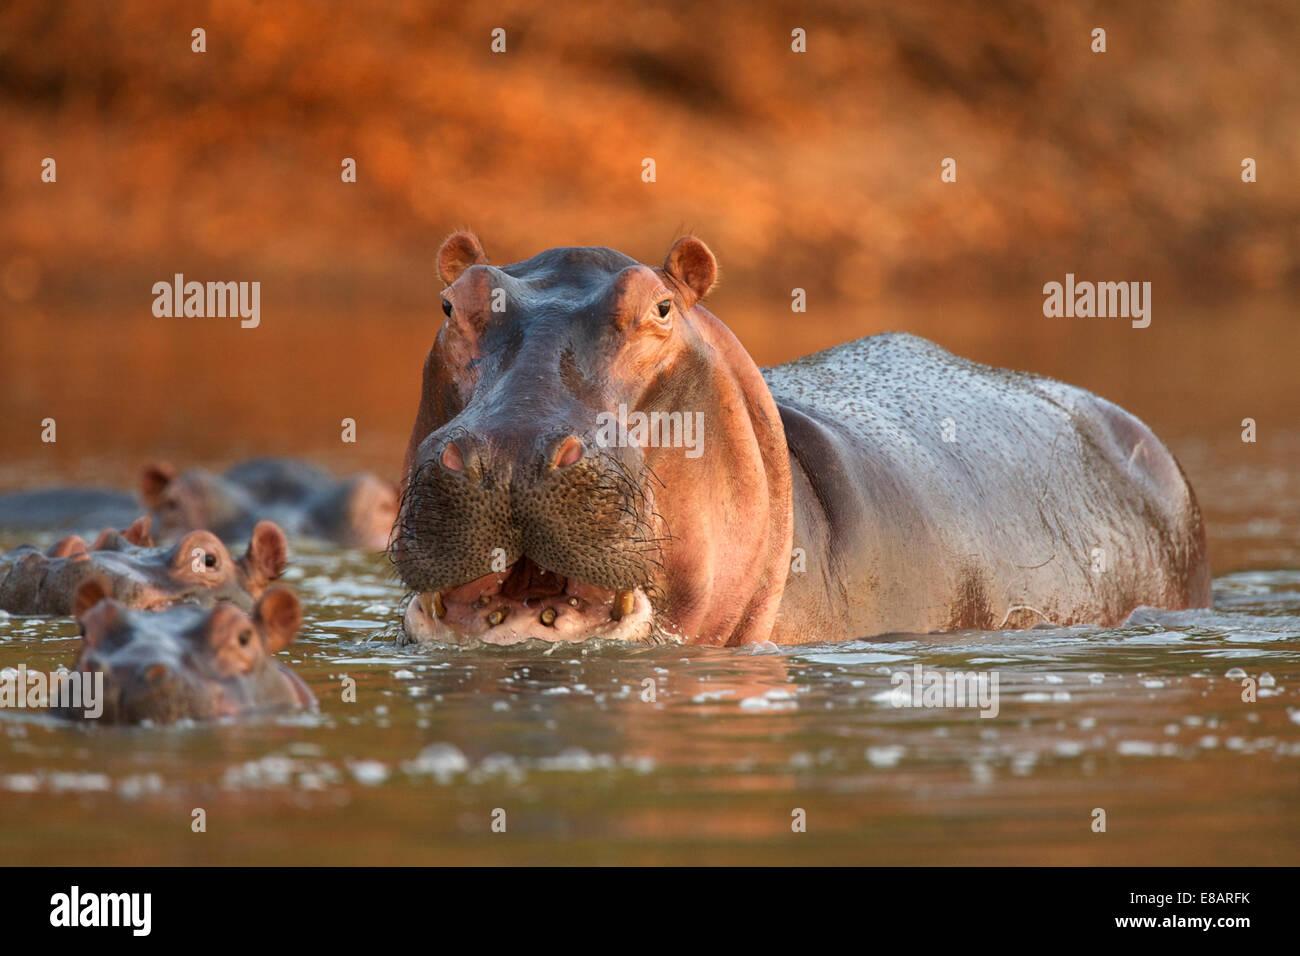 Alerta de hipopótamo (Hippopotamus amphibius), Parque Nacional de Mana Pools, Zimbabwe Imagen De Stock